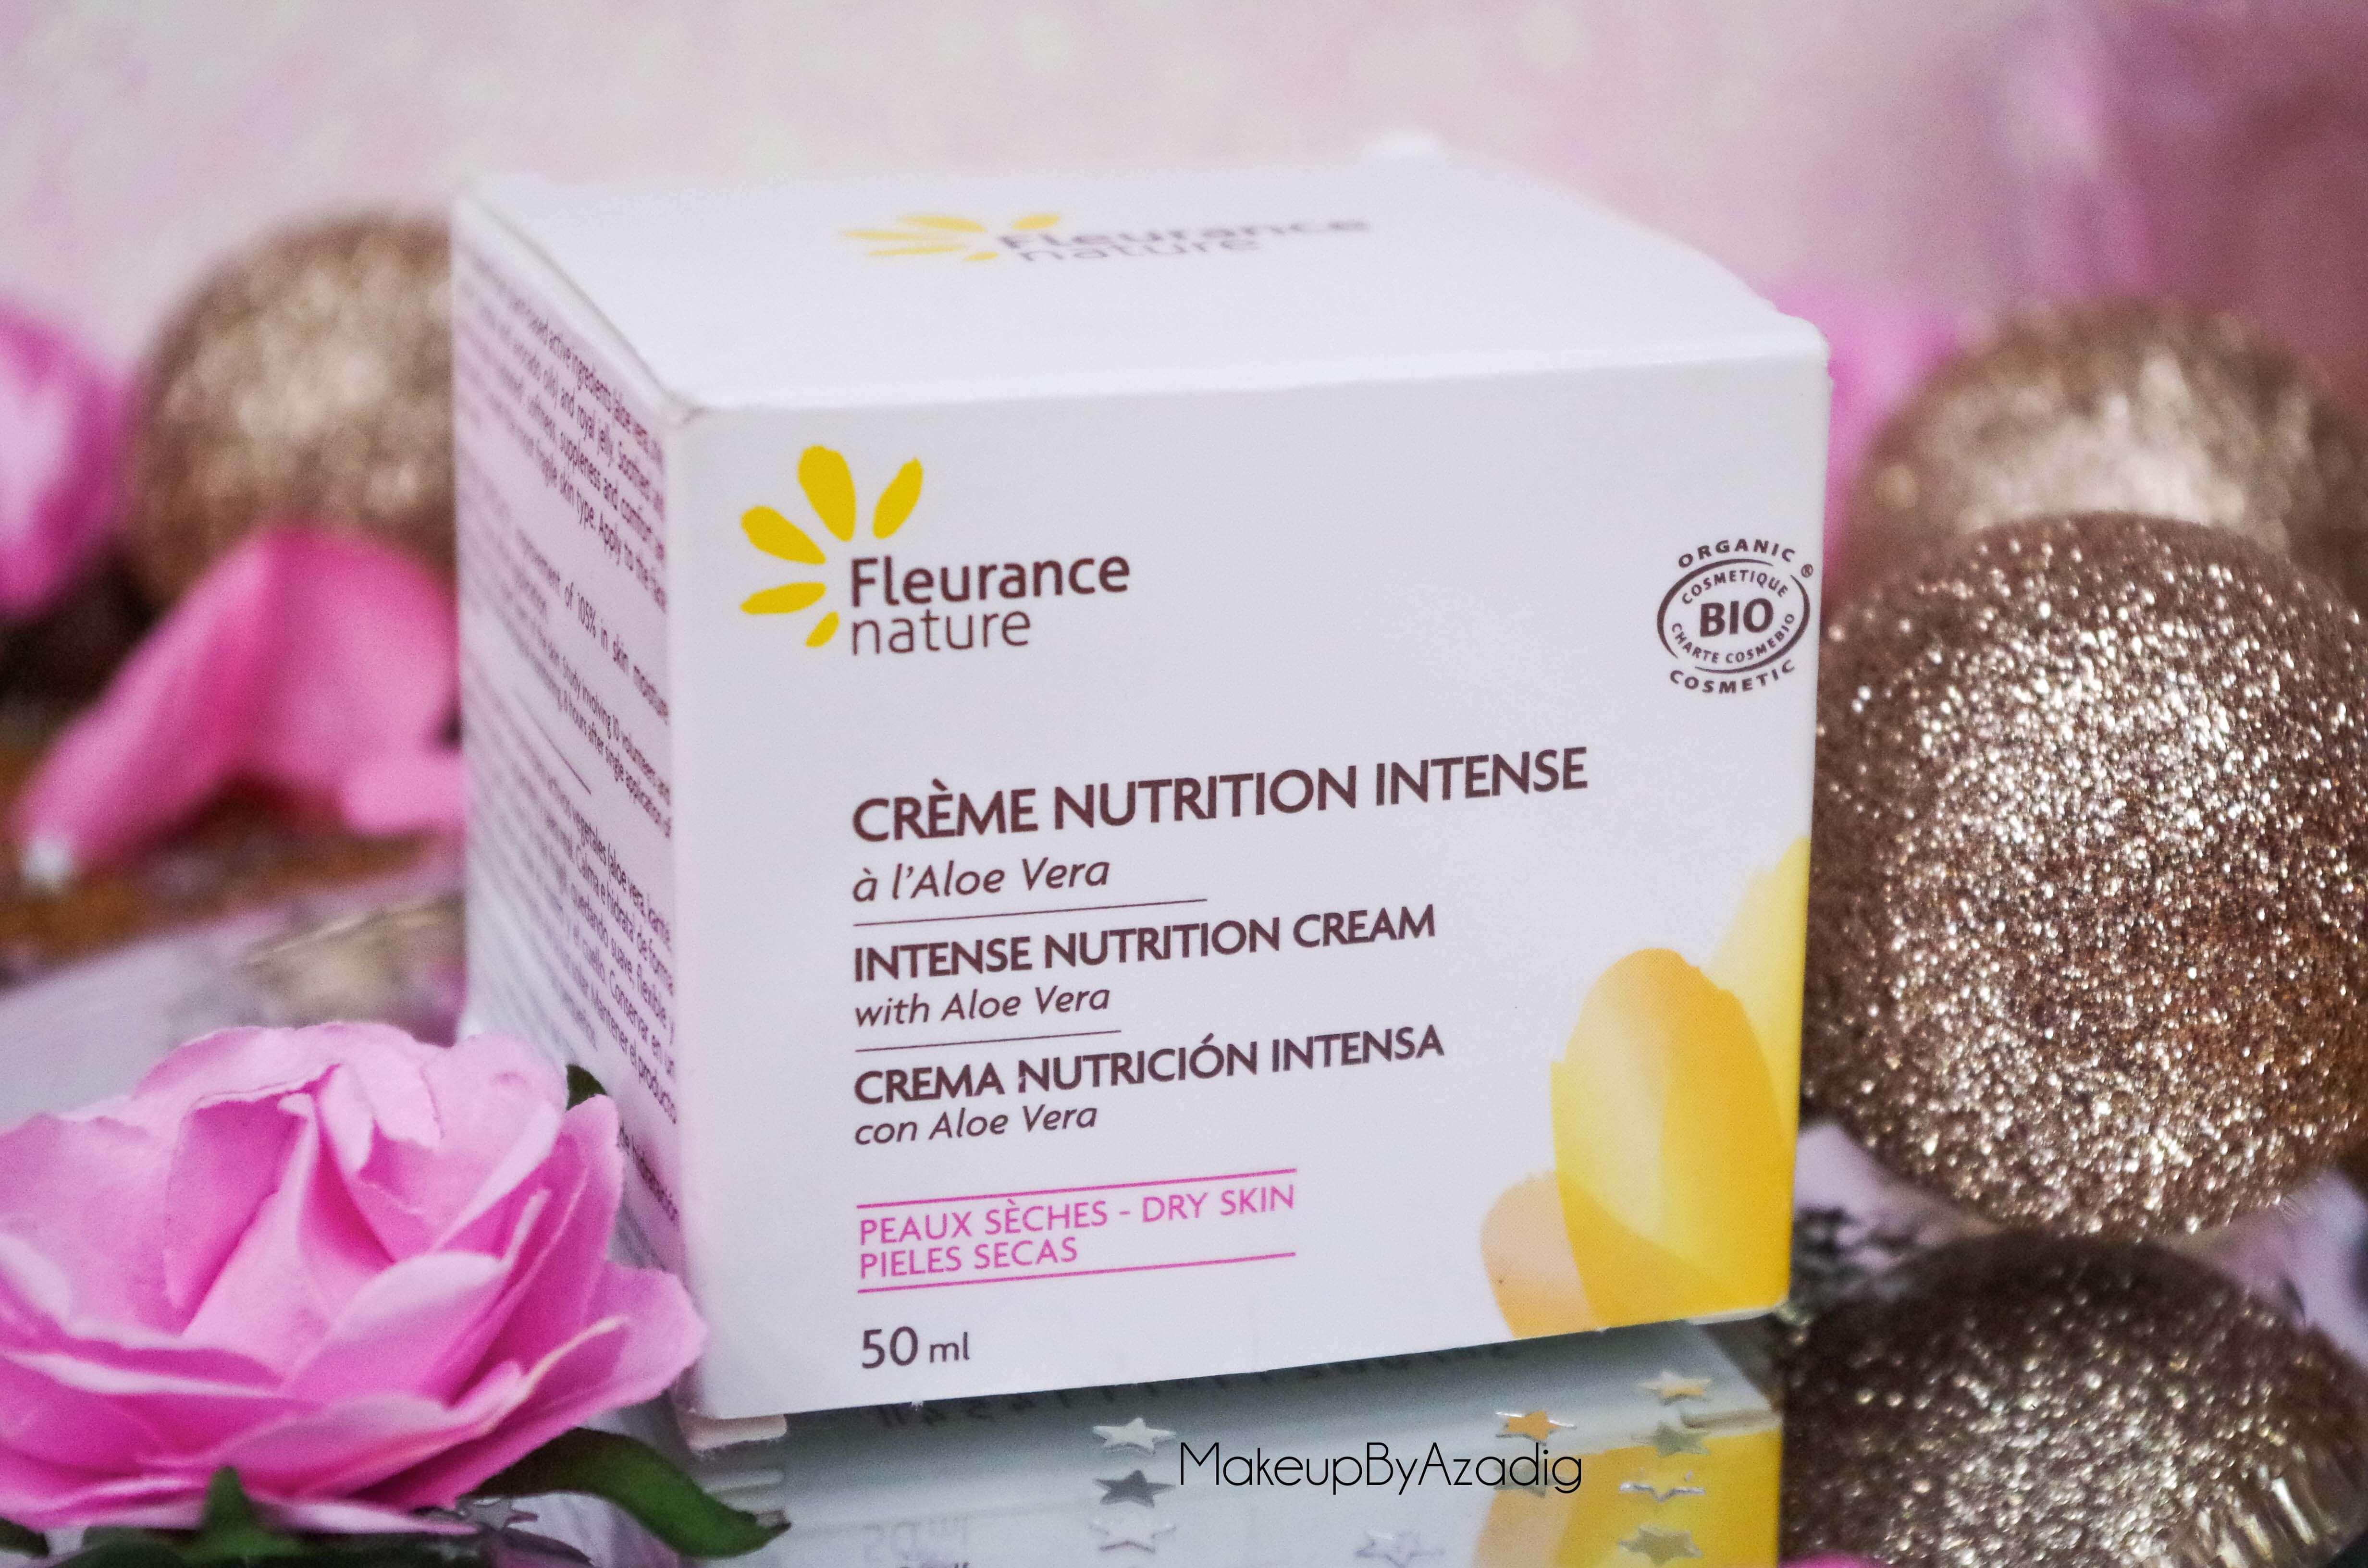 creme-nutrition-intense-serum-nuit-fleur-immortelle-fleurance-nature-makeupbyazadig-revue-prix-avis-aloe-vera